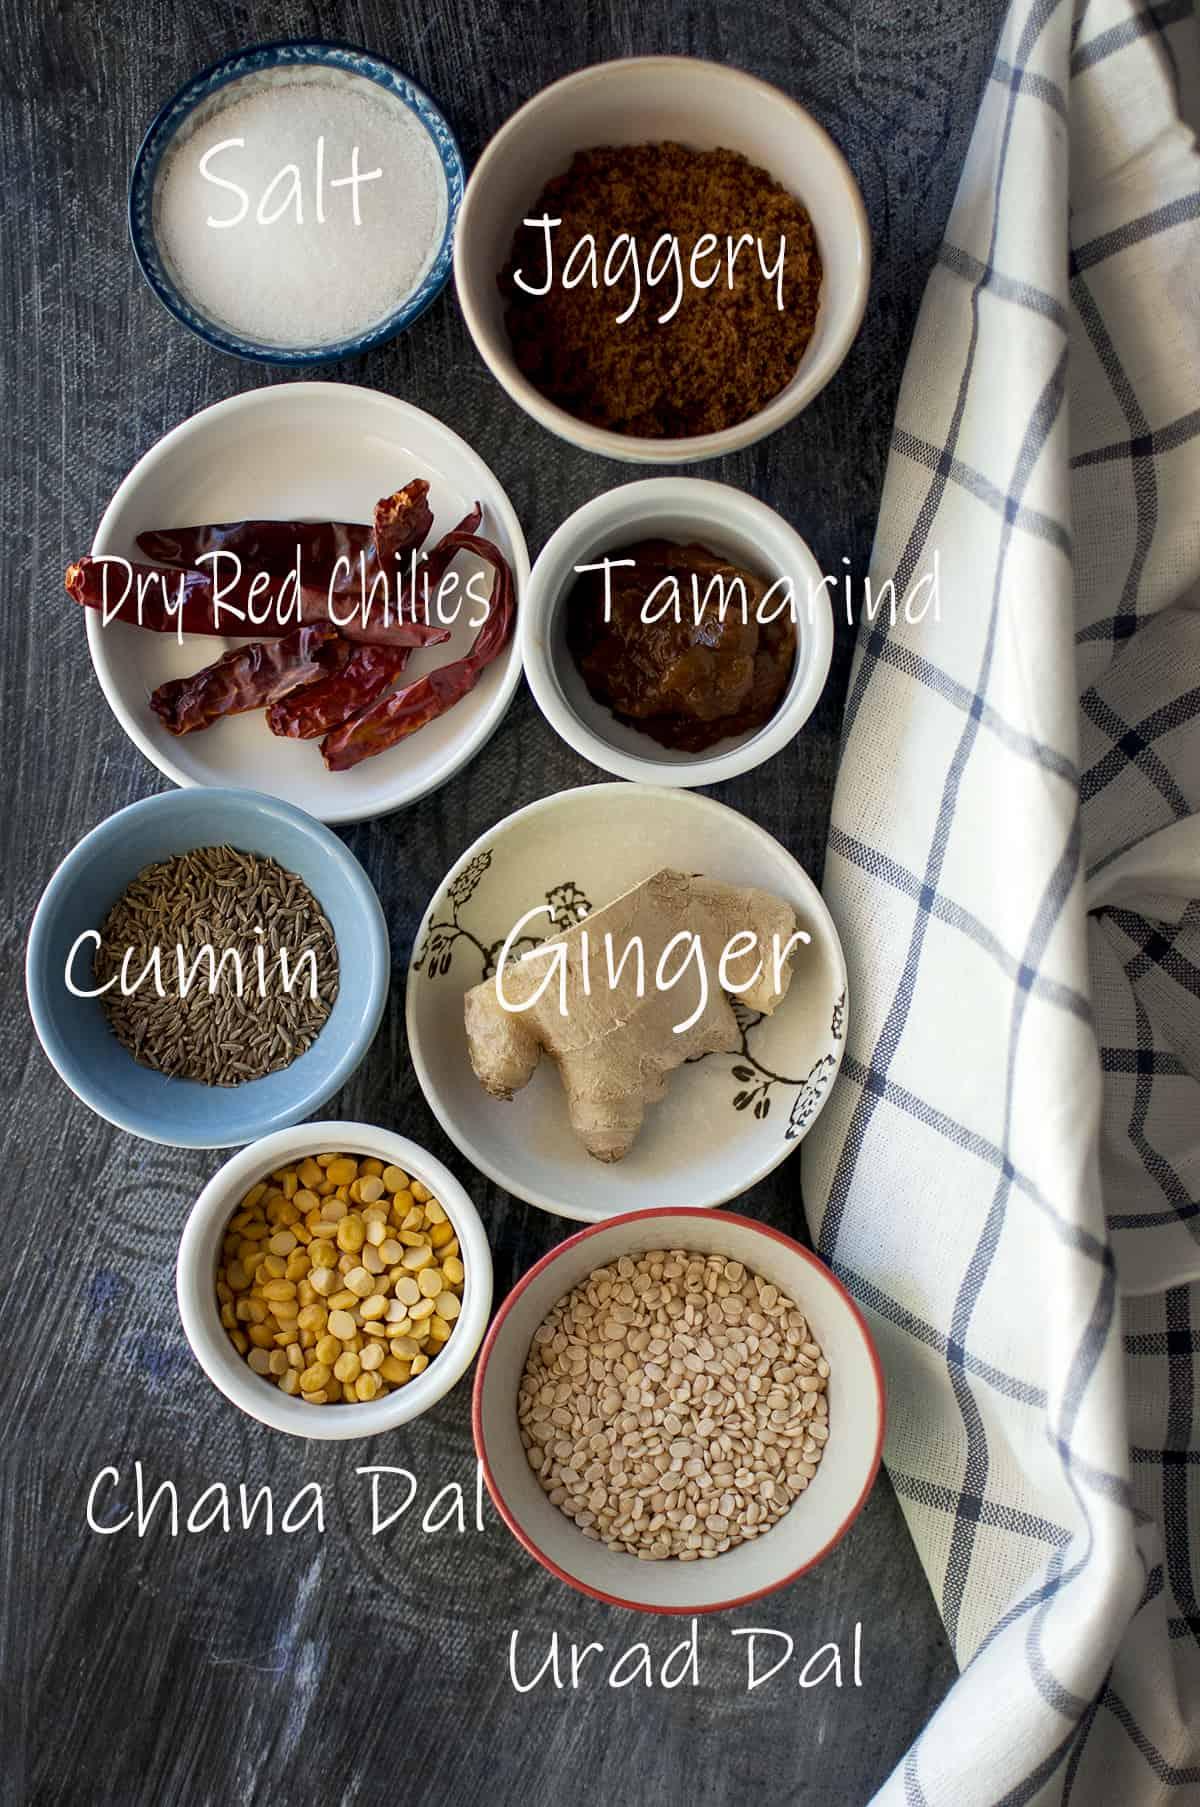 Ingredients needed to make ginger chutney - fresh ginger, urad, chana, cumin, dry red chilies, salt, jaggery & tamarind paste